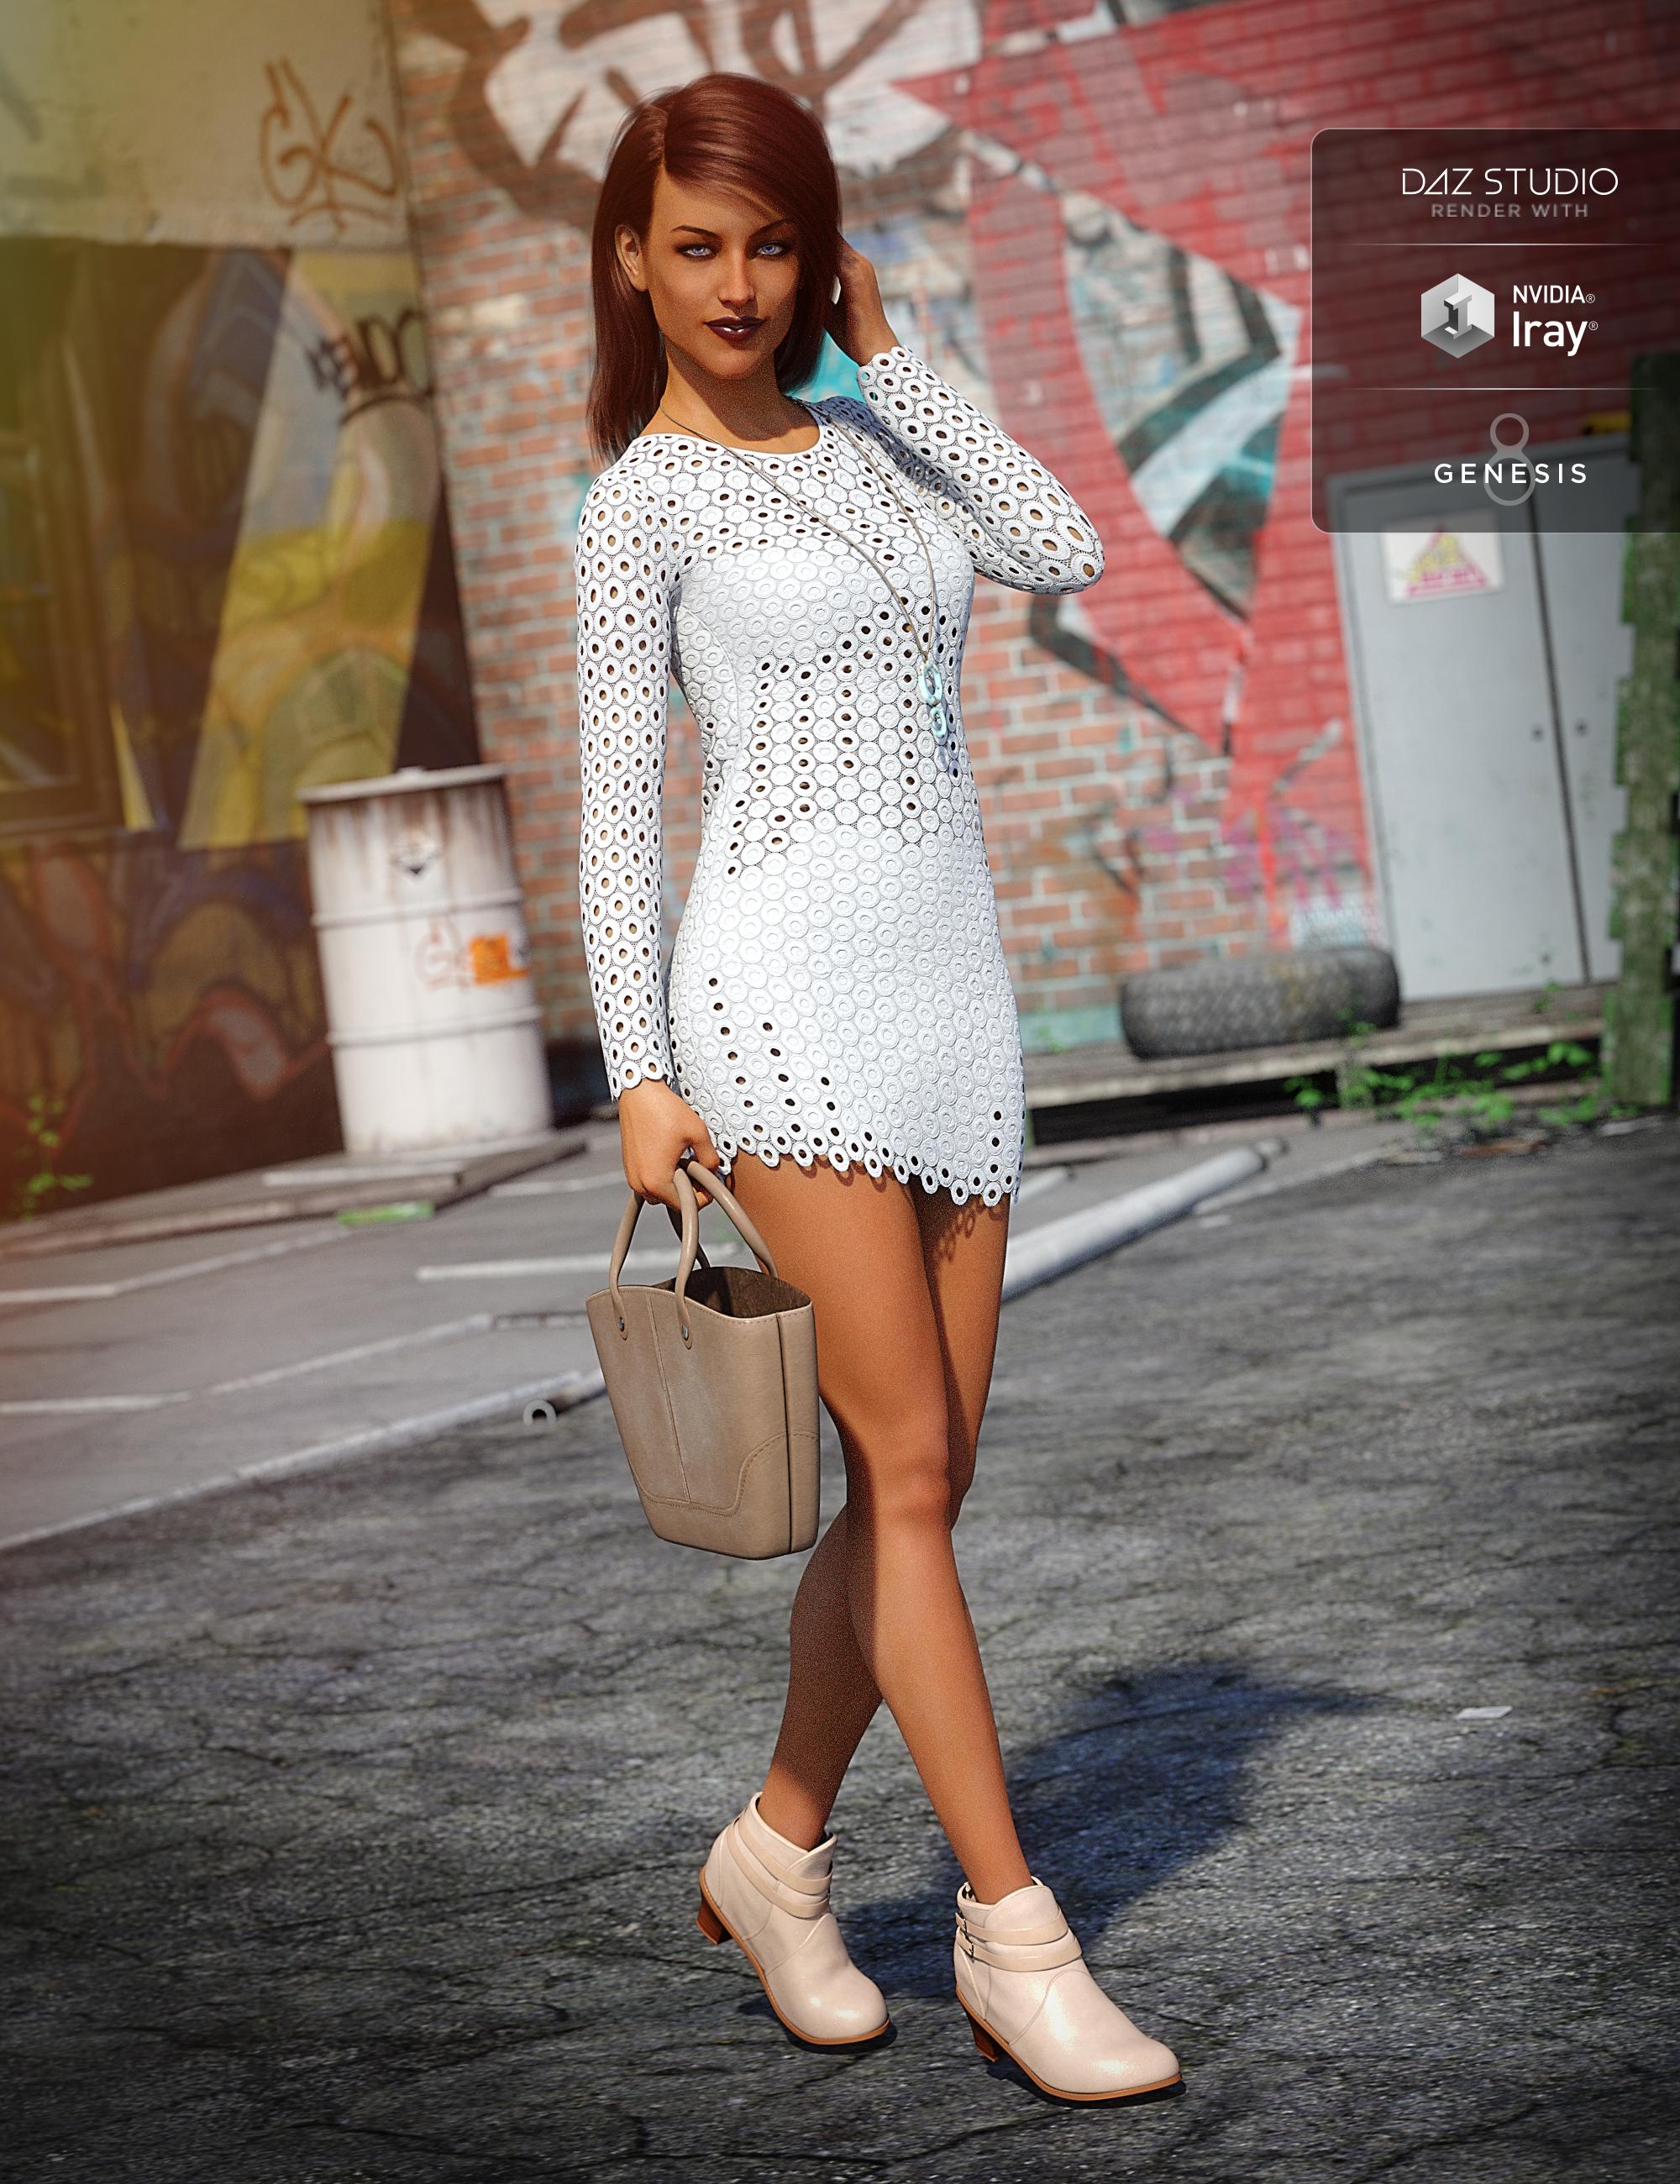 Crochet Dress Outfit for Genesis 8 Female(s) by: DirtyFairyNikisatez, 3D Models by Daz 3D